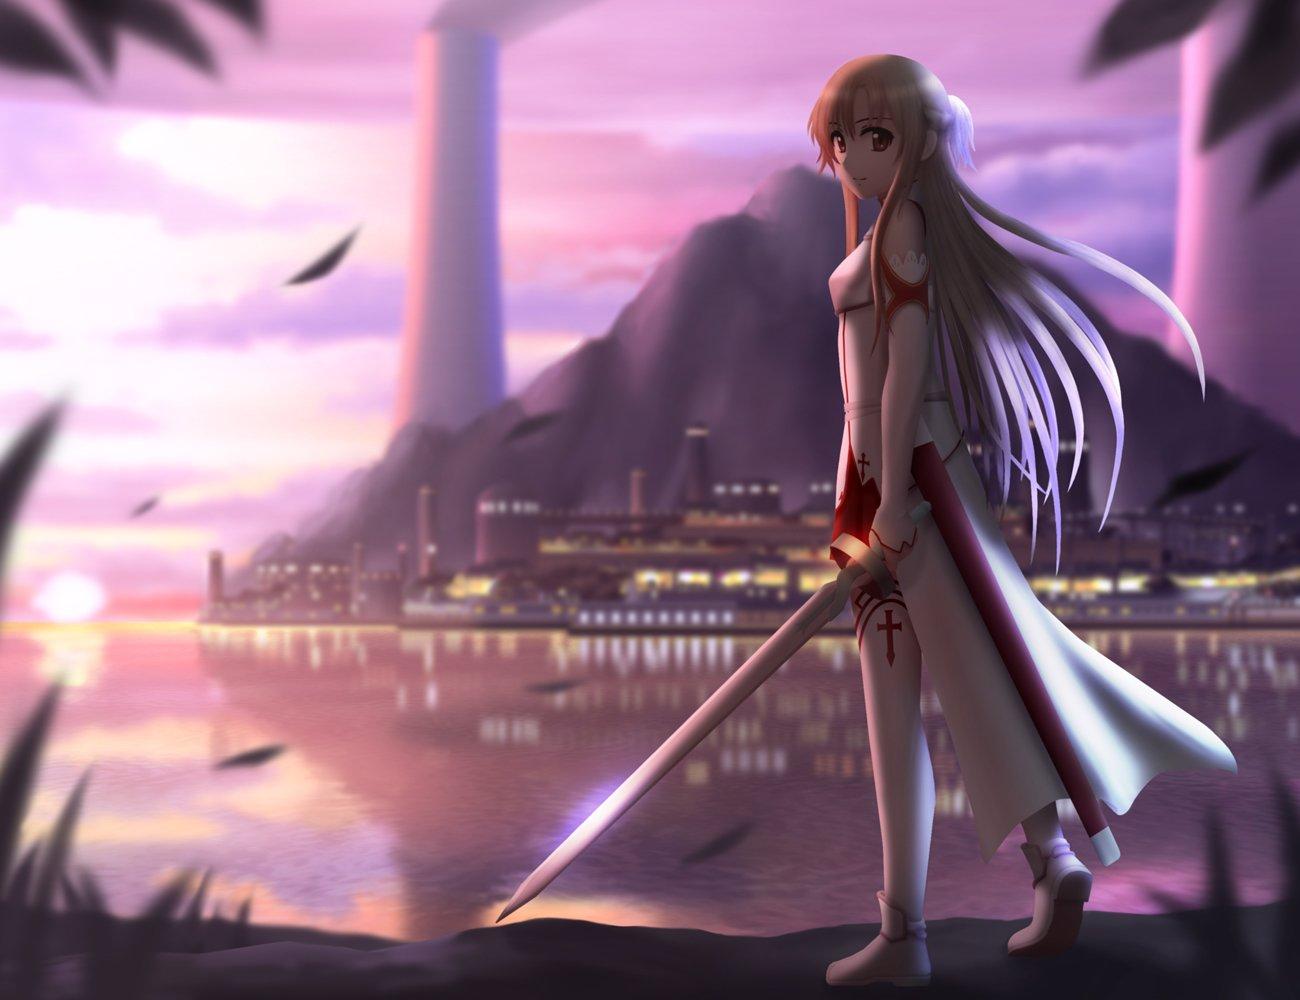 Anime - Sword Art Online  Anime Sword Asuna Yuuki Wallpaper